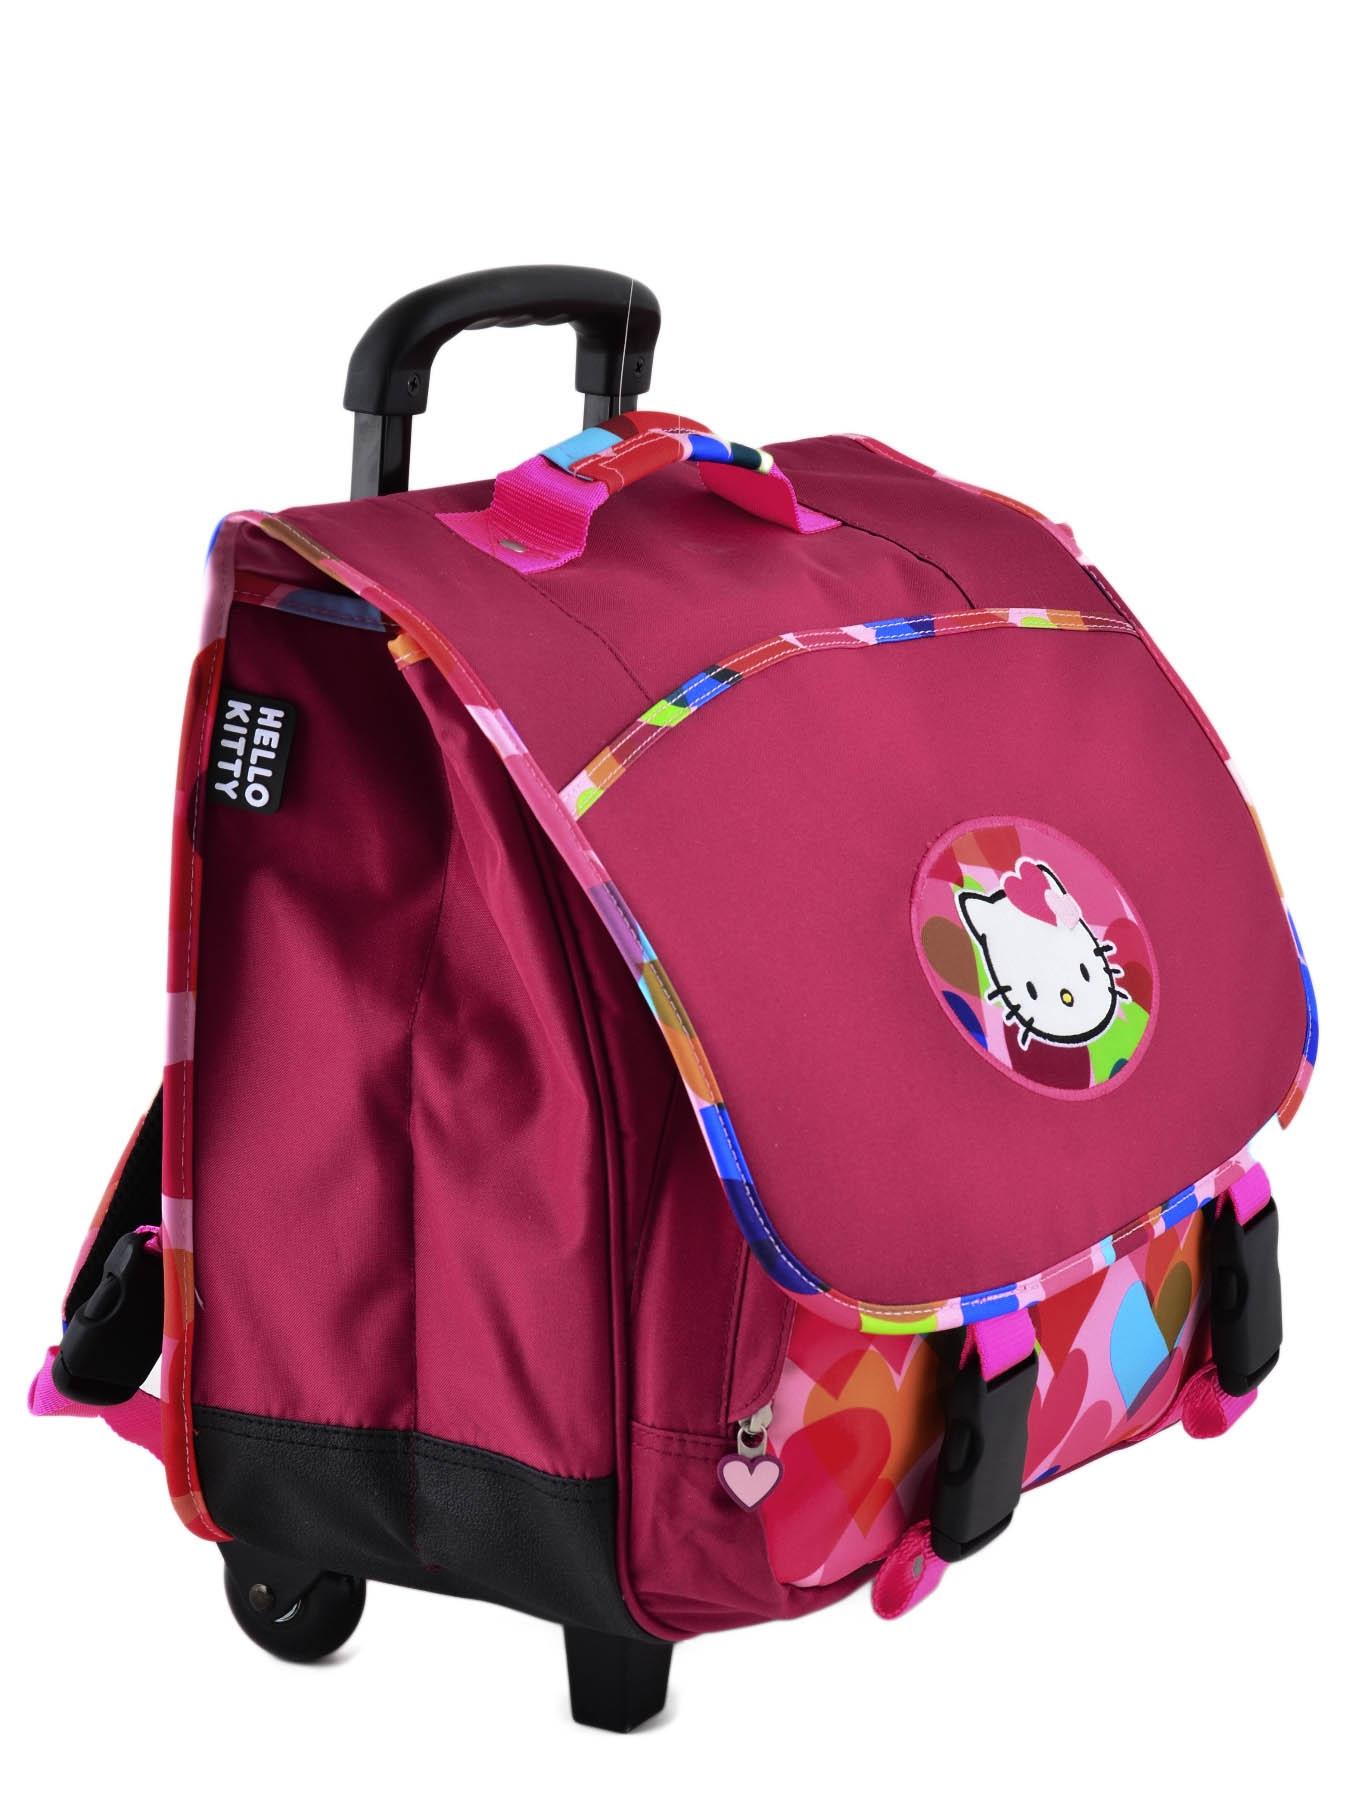 Школьный портфель на колесах Hello Kitty арт. HPS23070R, - фото 4